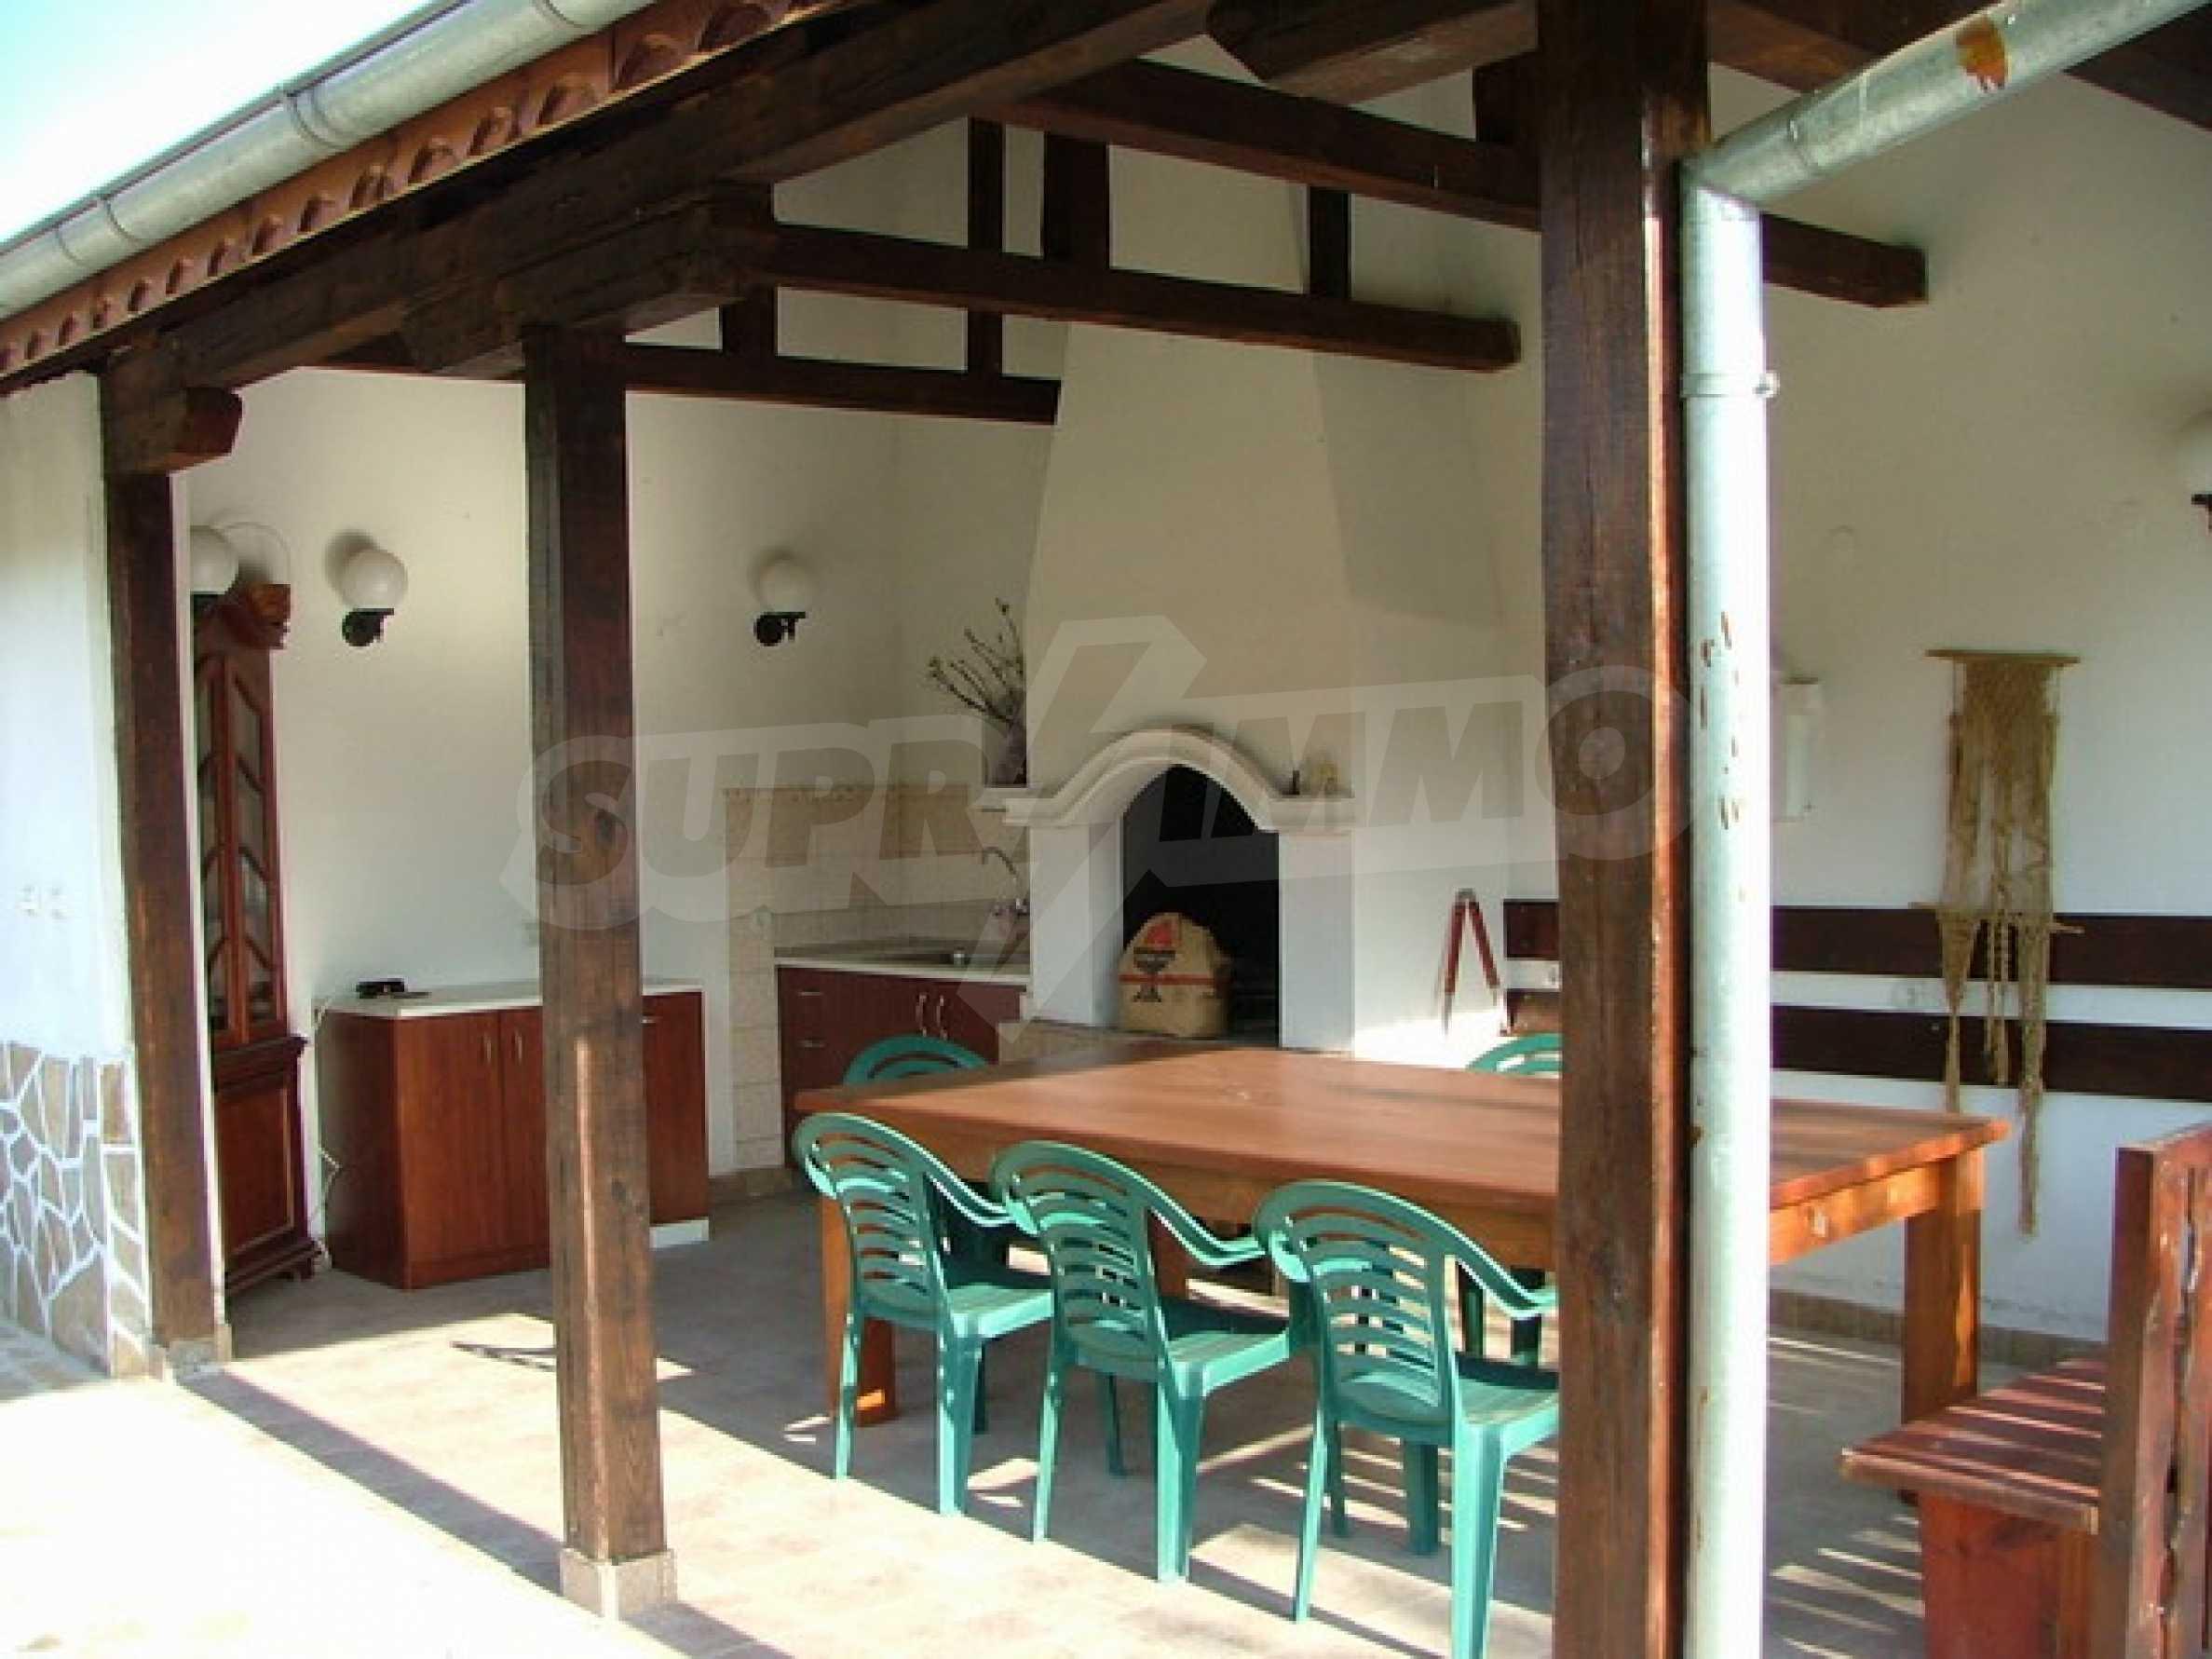 Stilvoll renovierte Villa 12 km entfernt. von Veliko Tarnovo 23